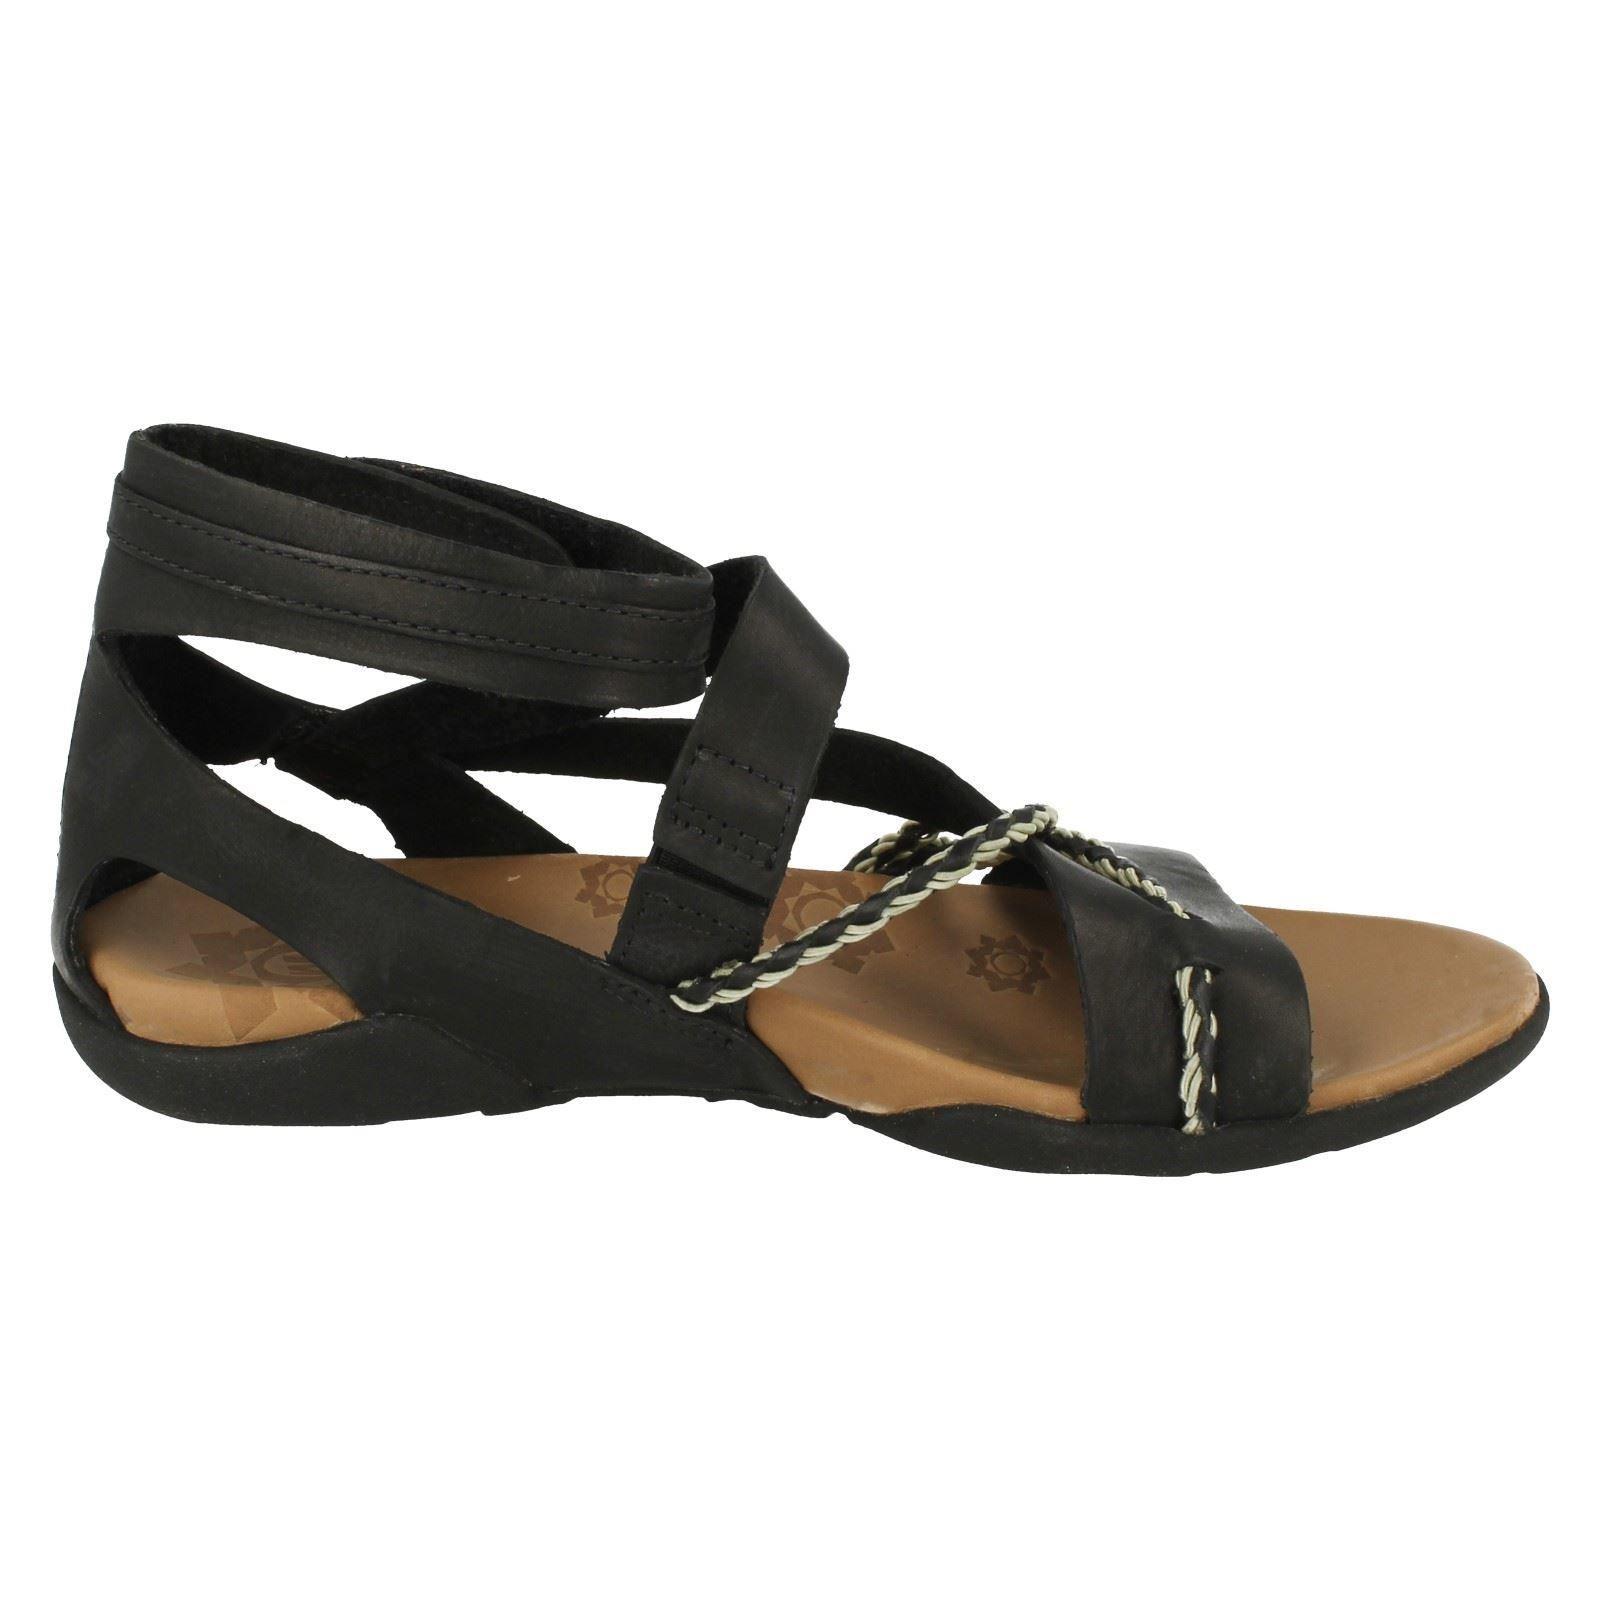 Ladies Merrell Summer Casual Gladiator Style Sandals Henna